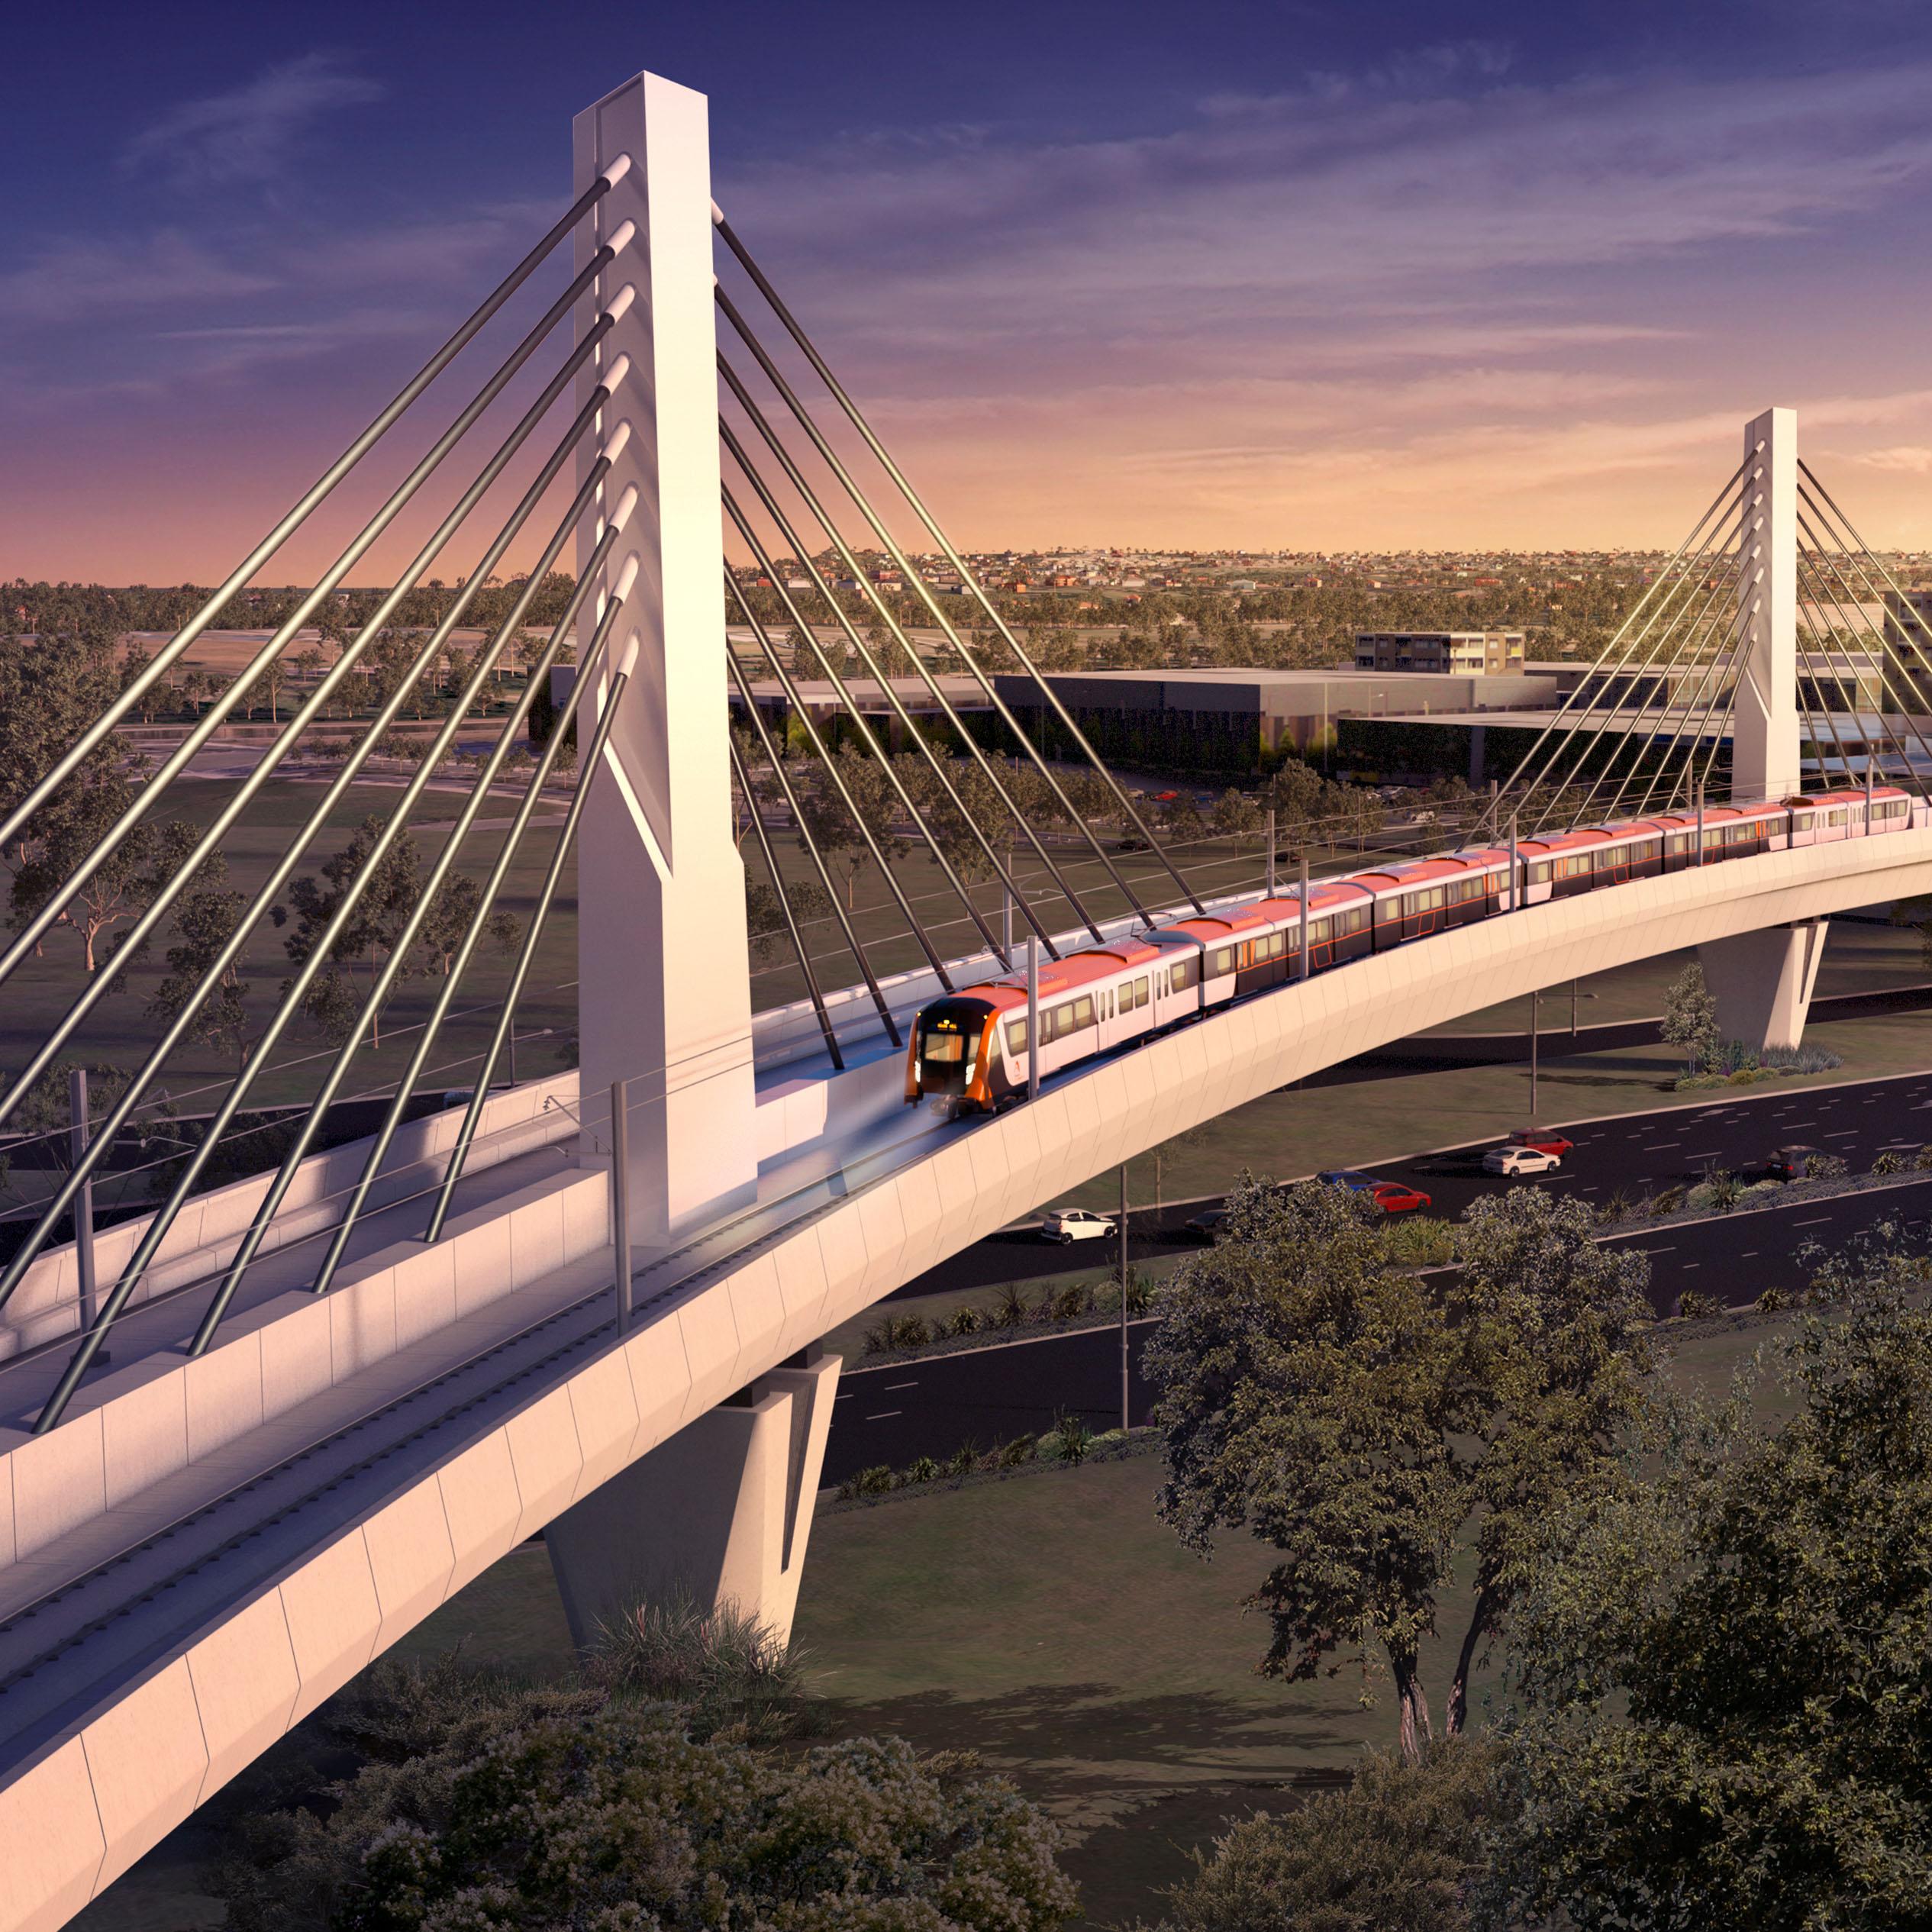 Highway Engineering Australia